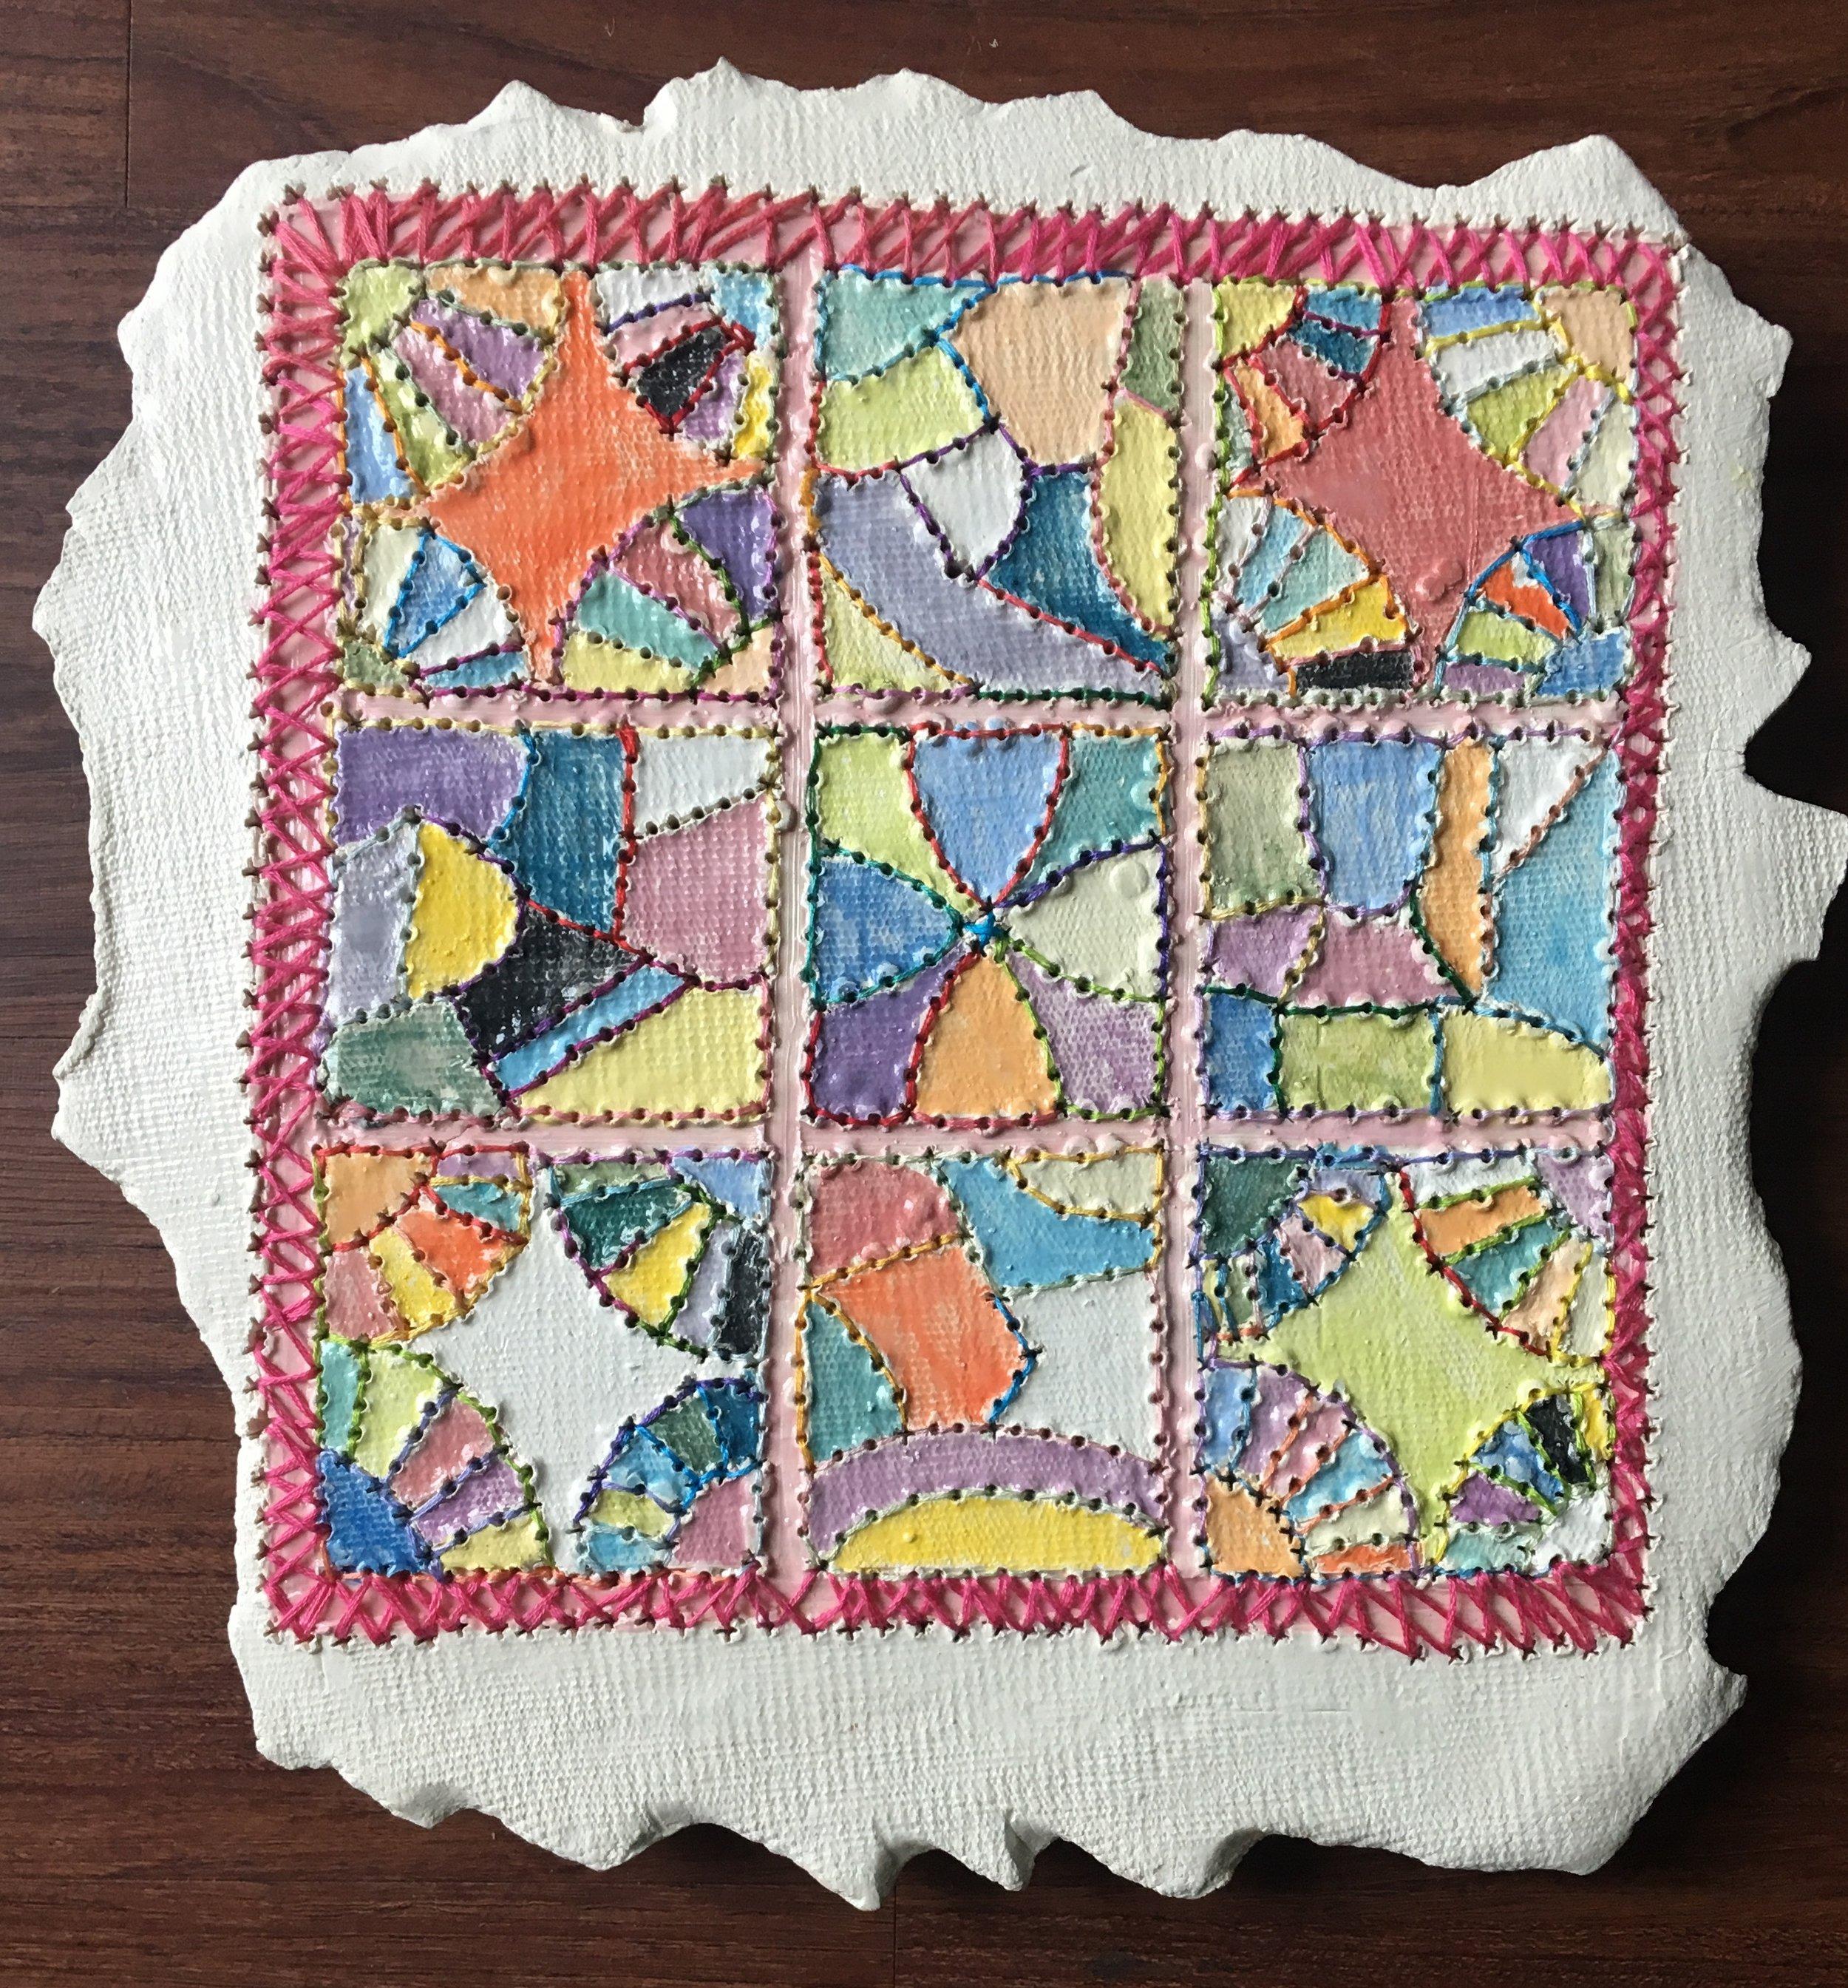 GalleryOonH-Kasse Andrews Weller-Remnant Quilt-2018-Ceramic-11x11-450.jpg